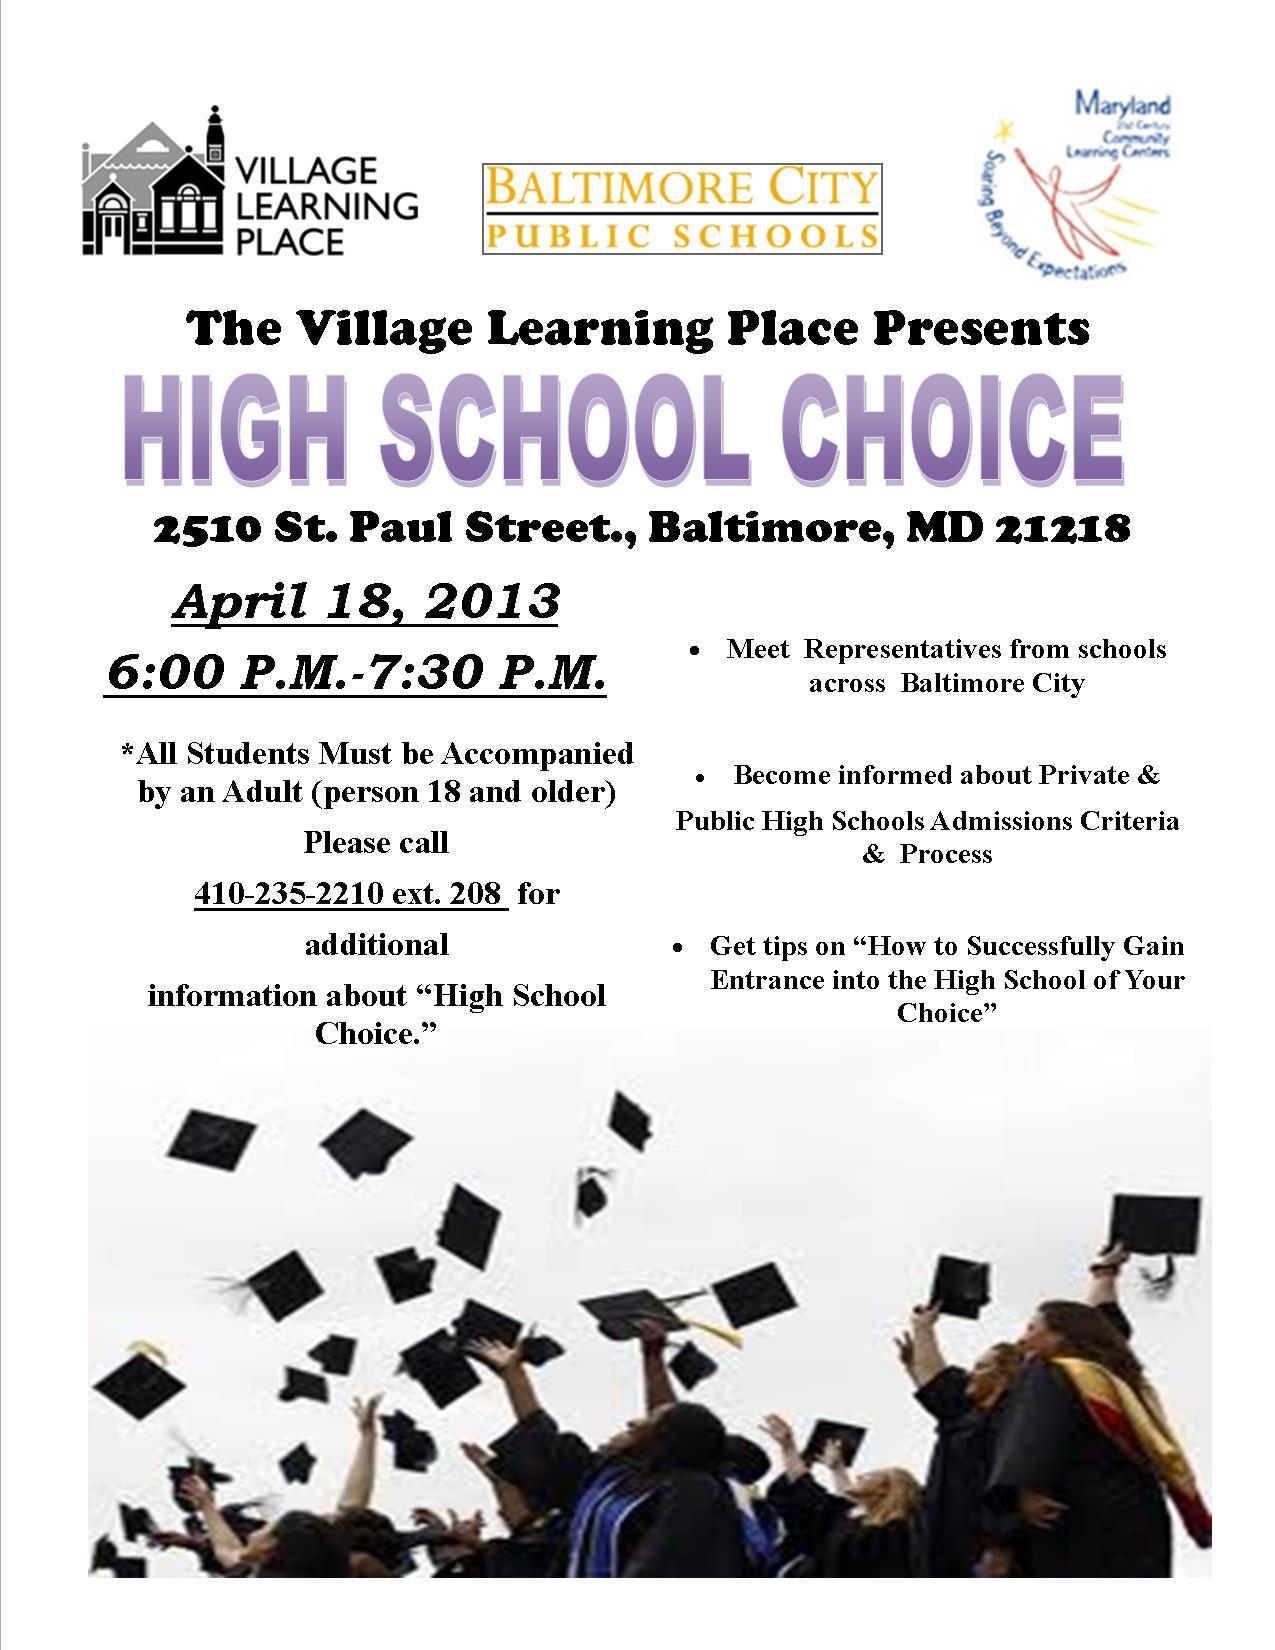 High School Choice Flyer 2012-2013